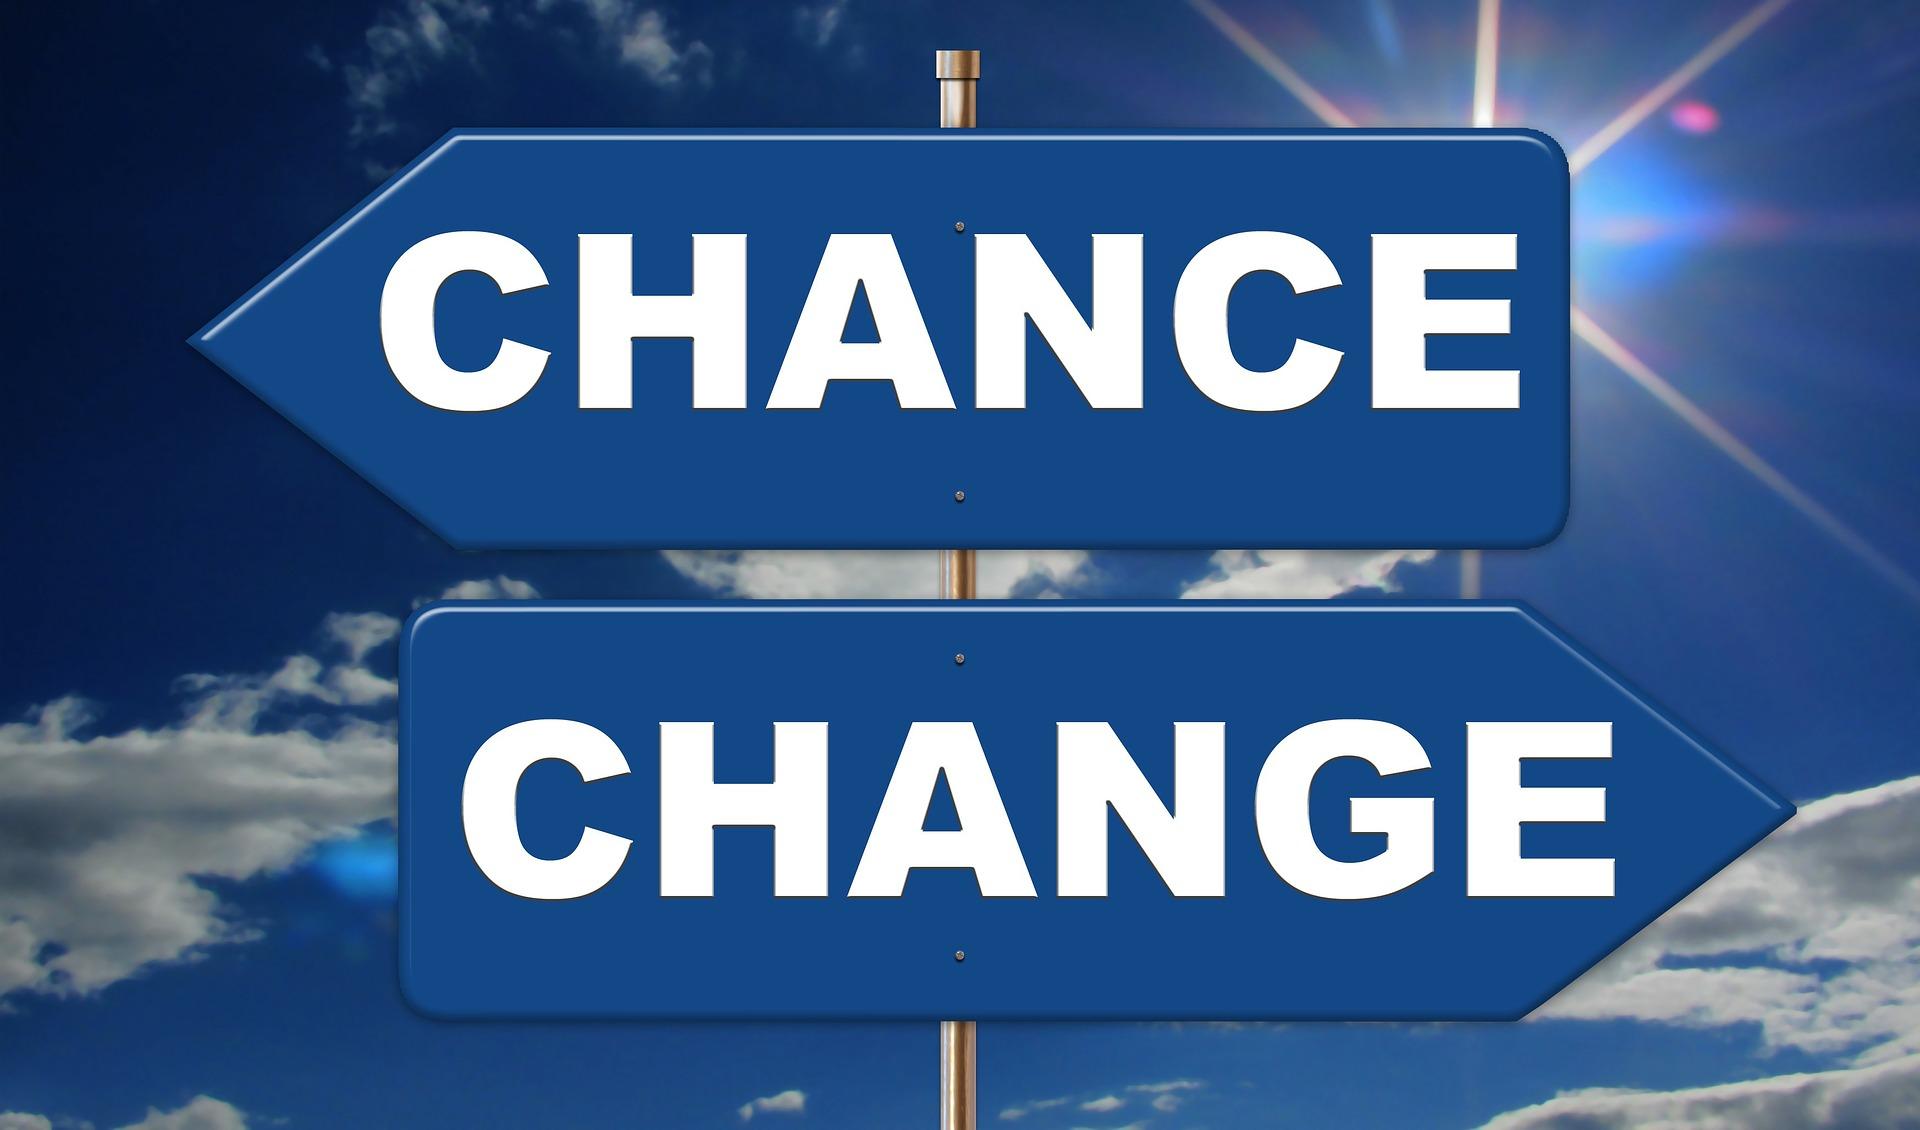 Change & Chance